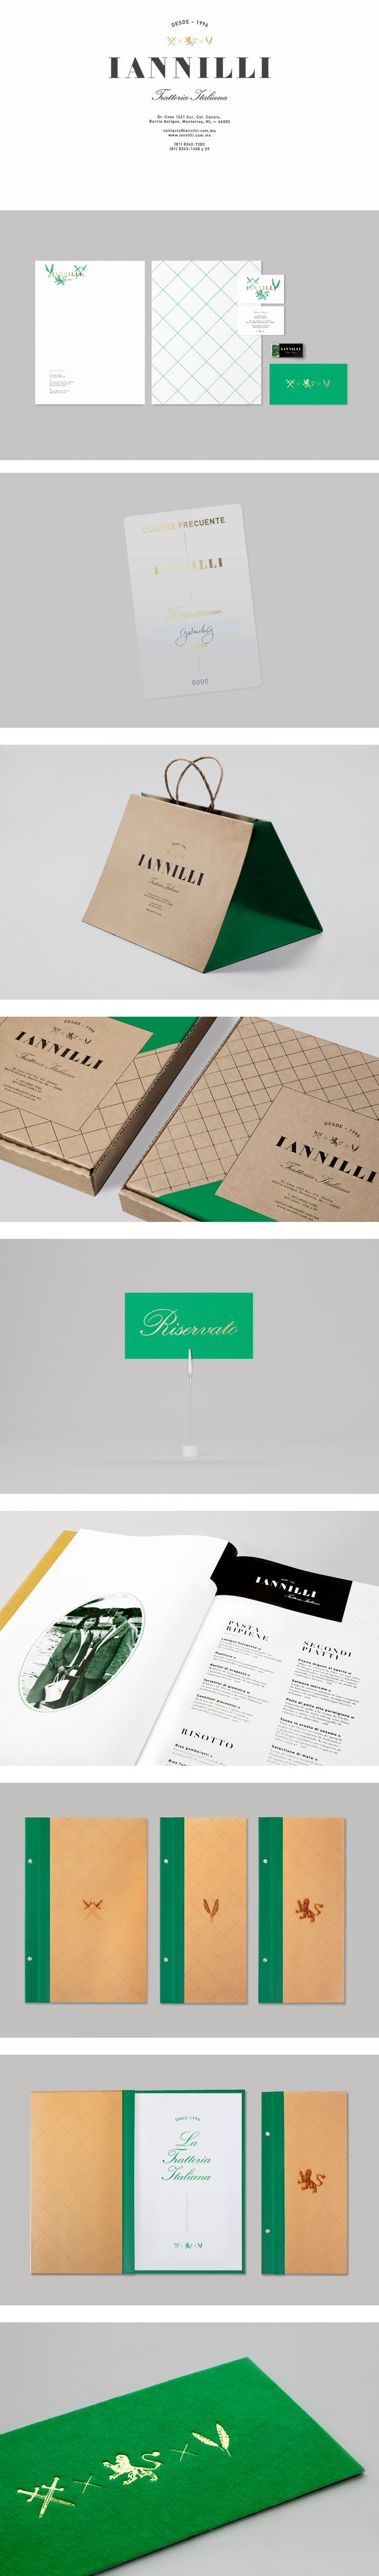 IANNILLI | Saavy Studio #packaging #branding #marketing PD